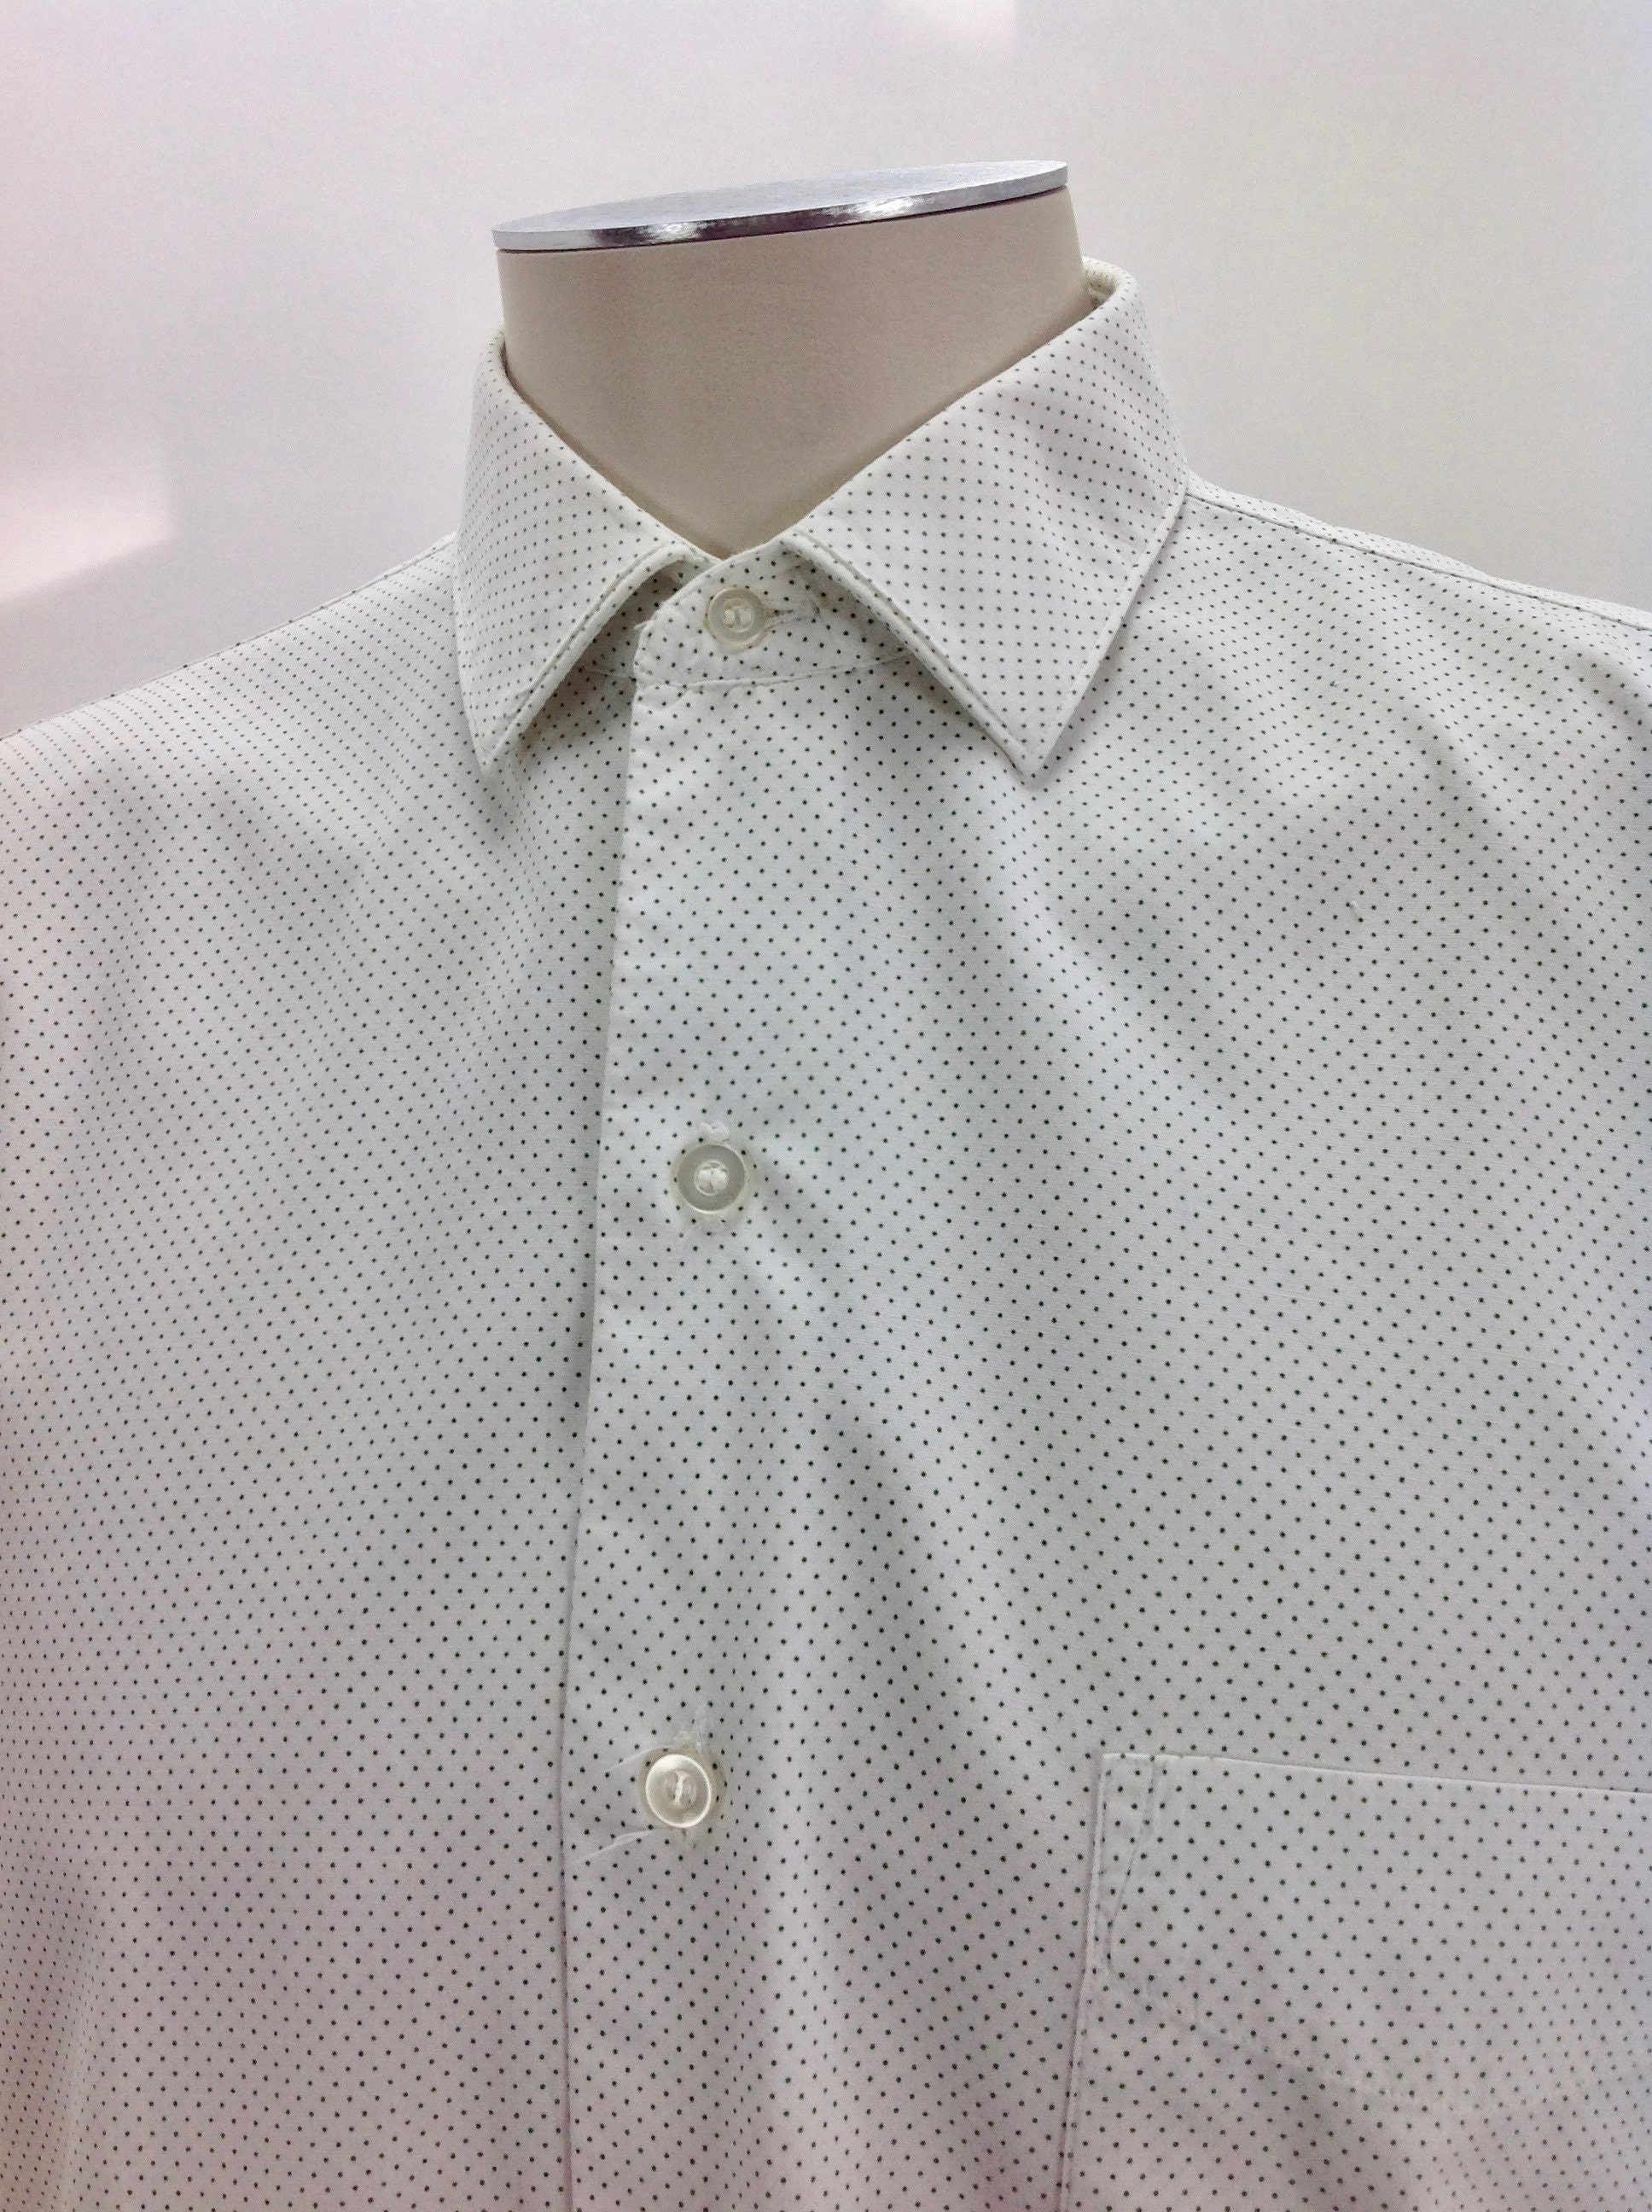 1960s – 70s Men's Ties | Skinny Ties, Slim Ties Vintage 1960s Dress Shirt - French Cuffs Excellent Quality Crisp Medium Weight Cotton Mens Size $110.00 AT vintagedancer.com